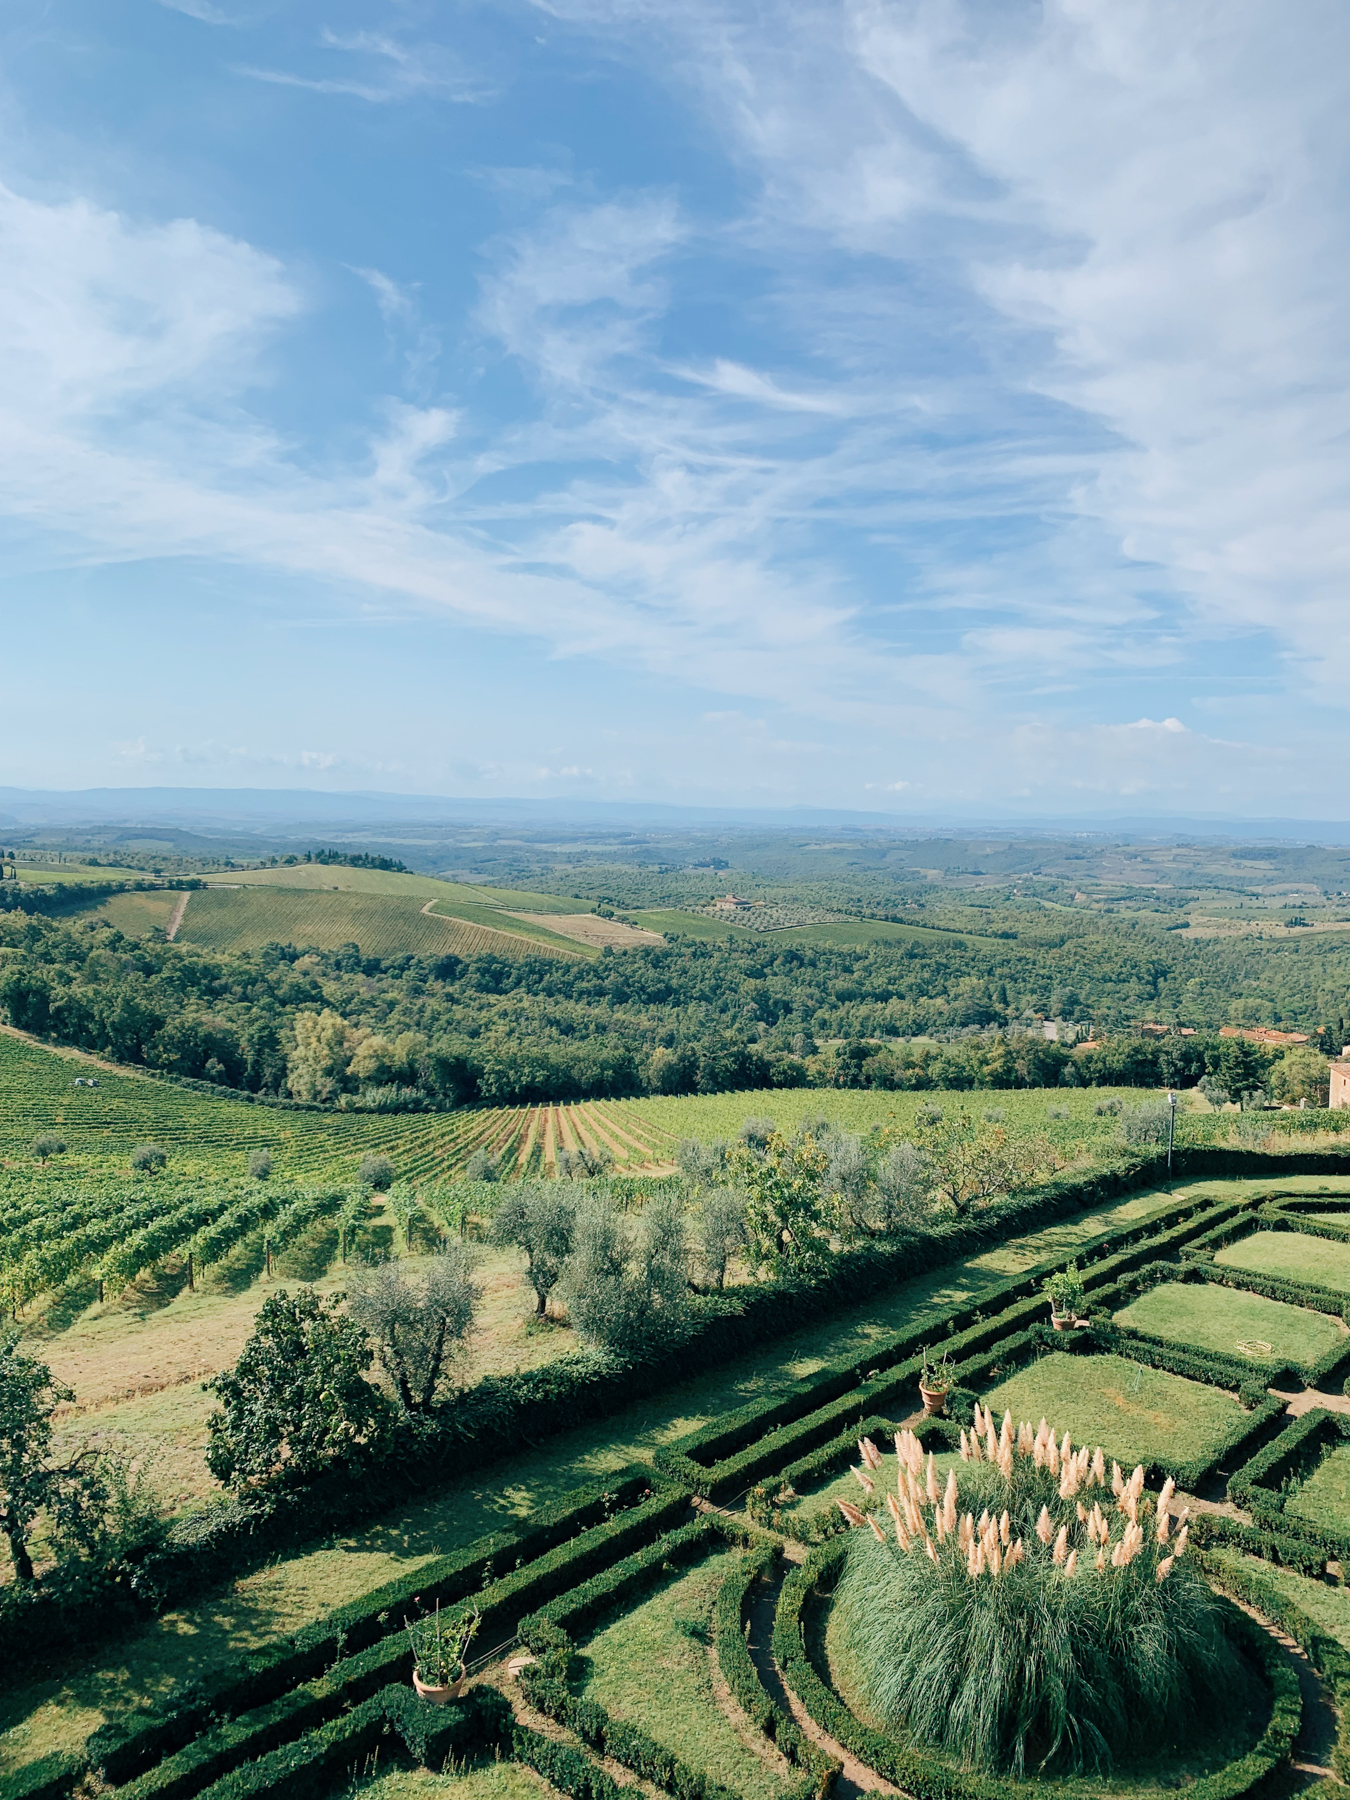 Ricasoli winery, at the Castello di Brolio, view of the gardens below.